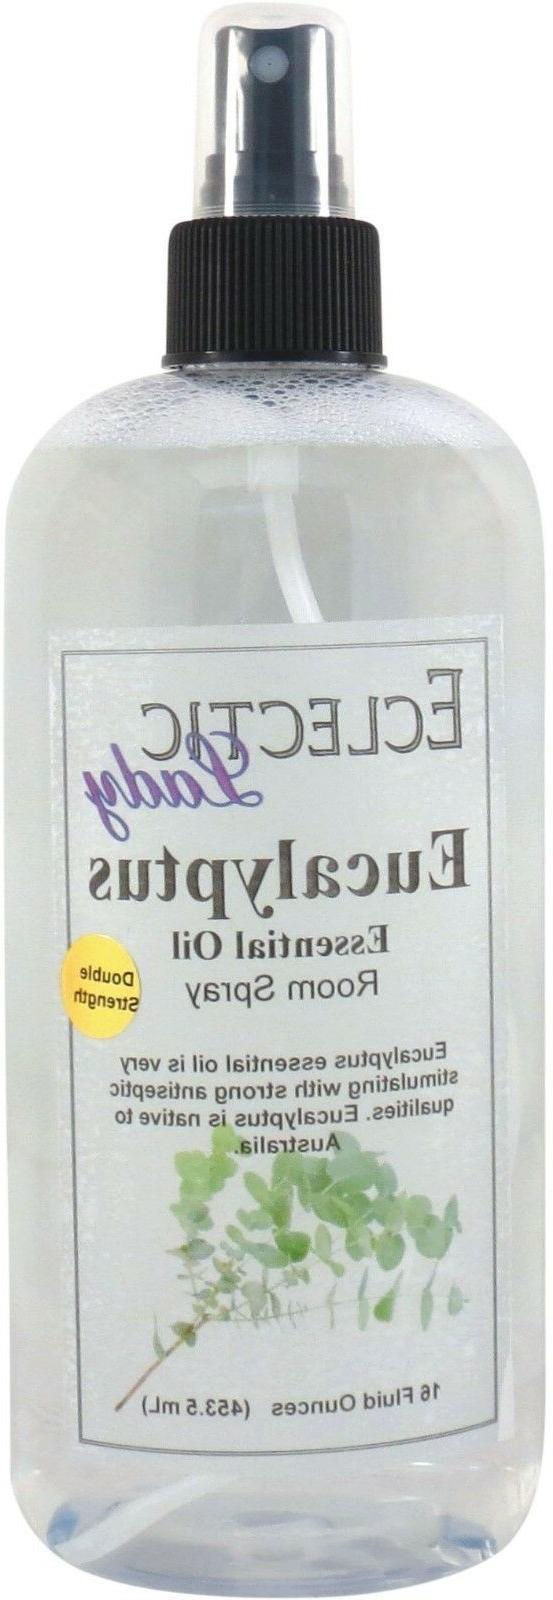 Eucalyptus Oil Spray